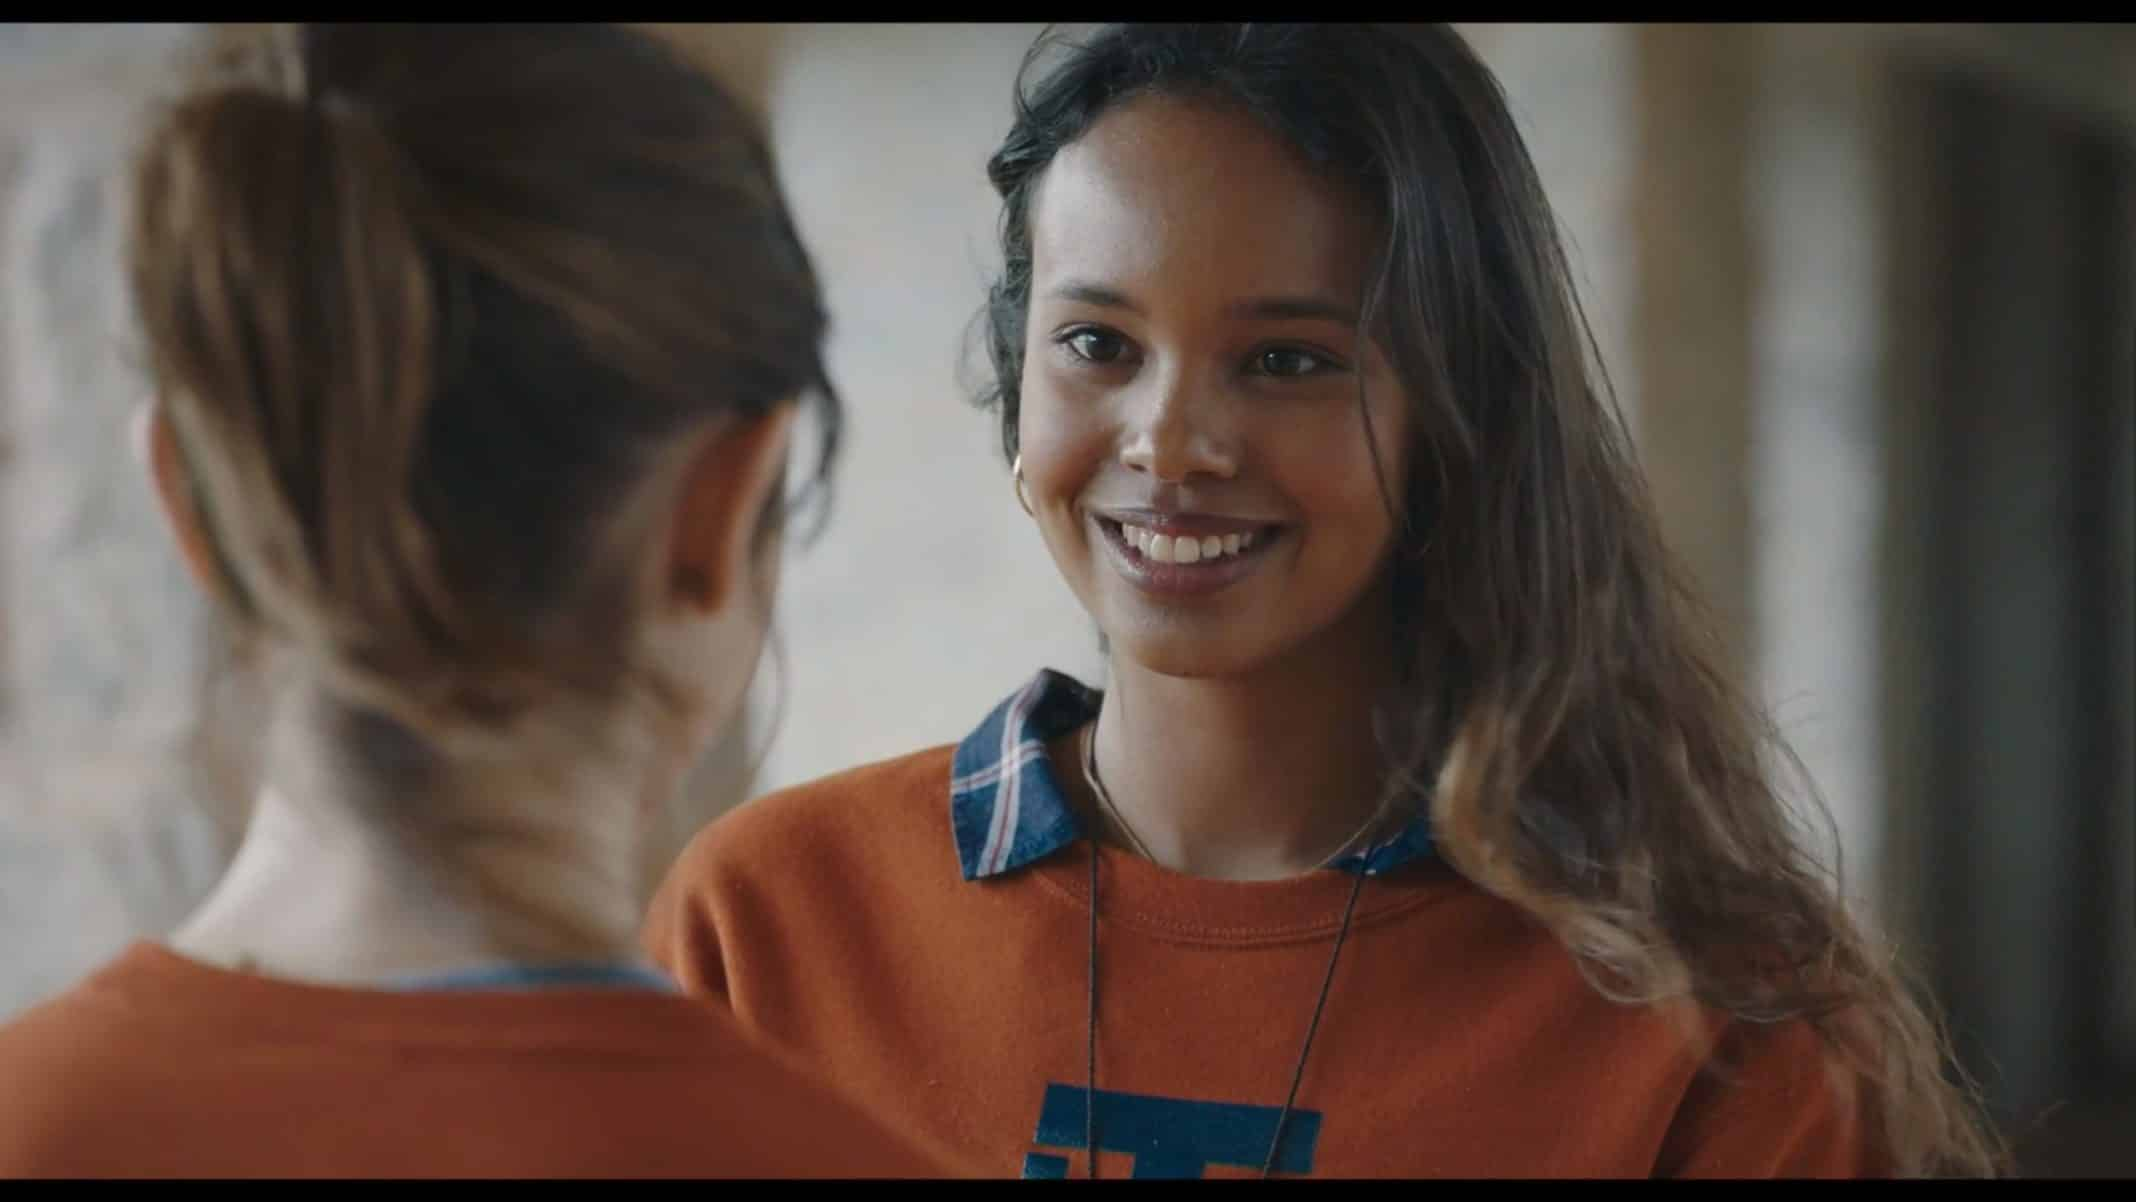 Nina (Alisha Boe) smiling and being shady.